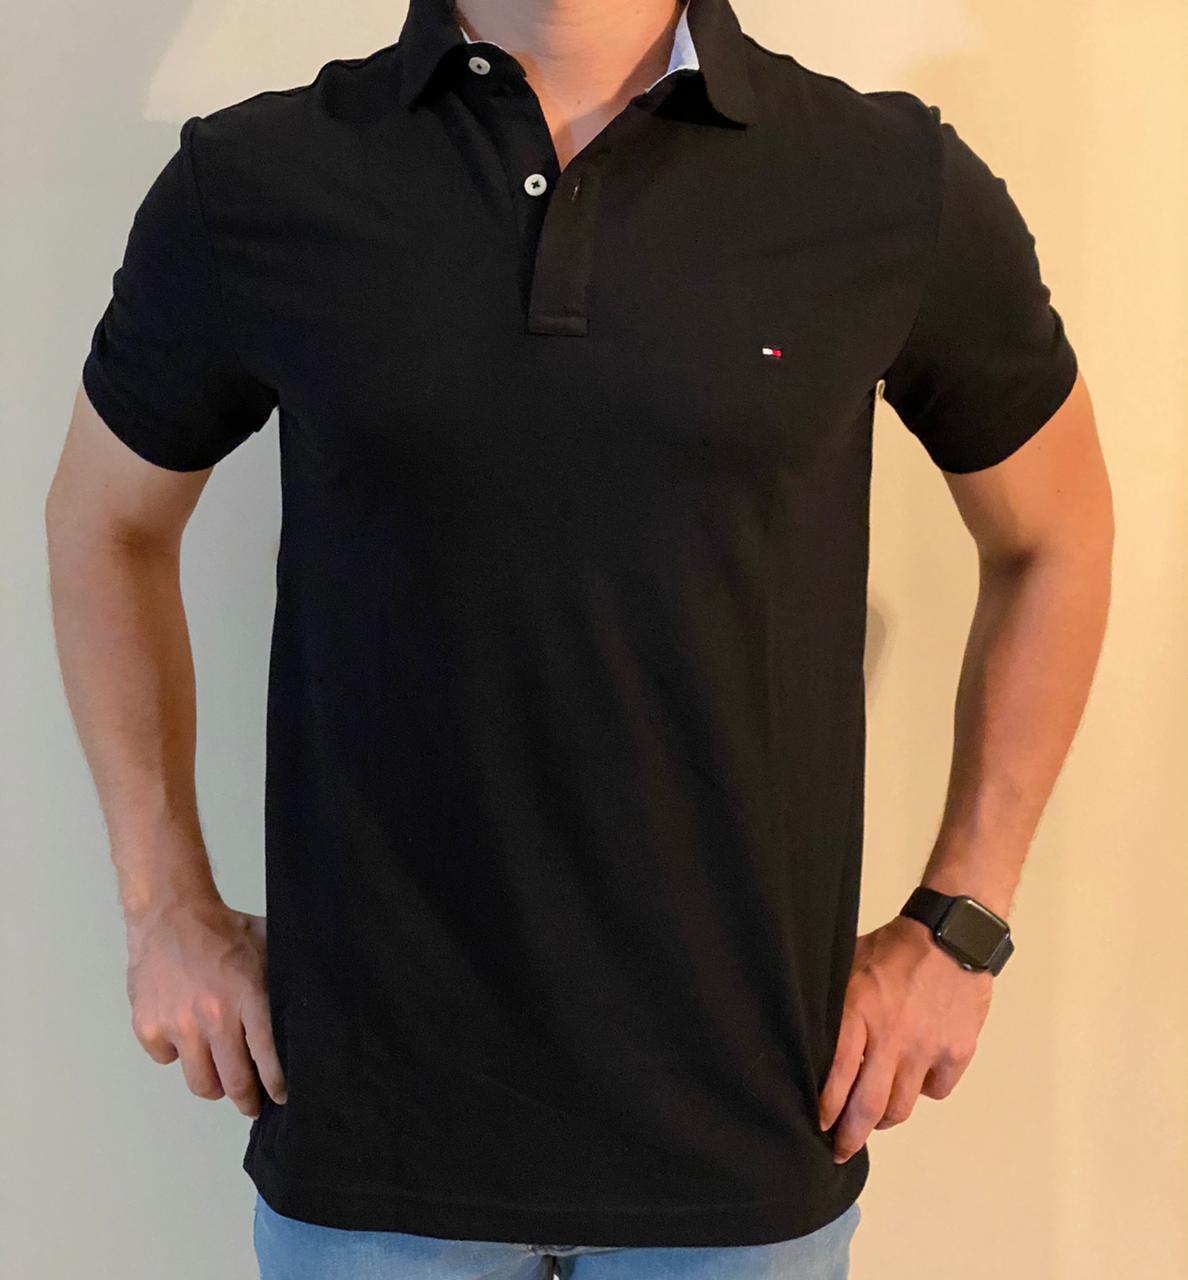 Camiseta Masculina Tommy Hilfiger Gola Polo Algodão Lisa - Preto